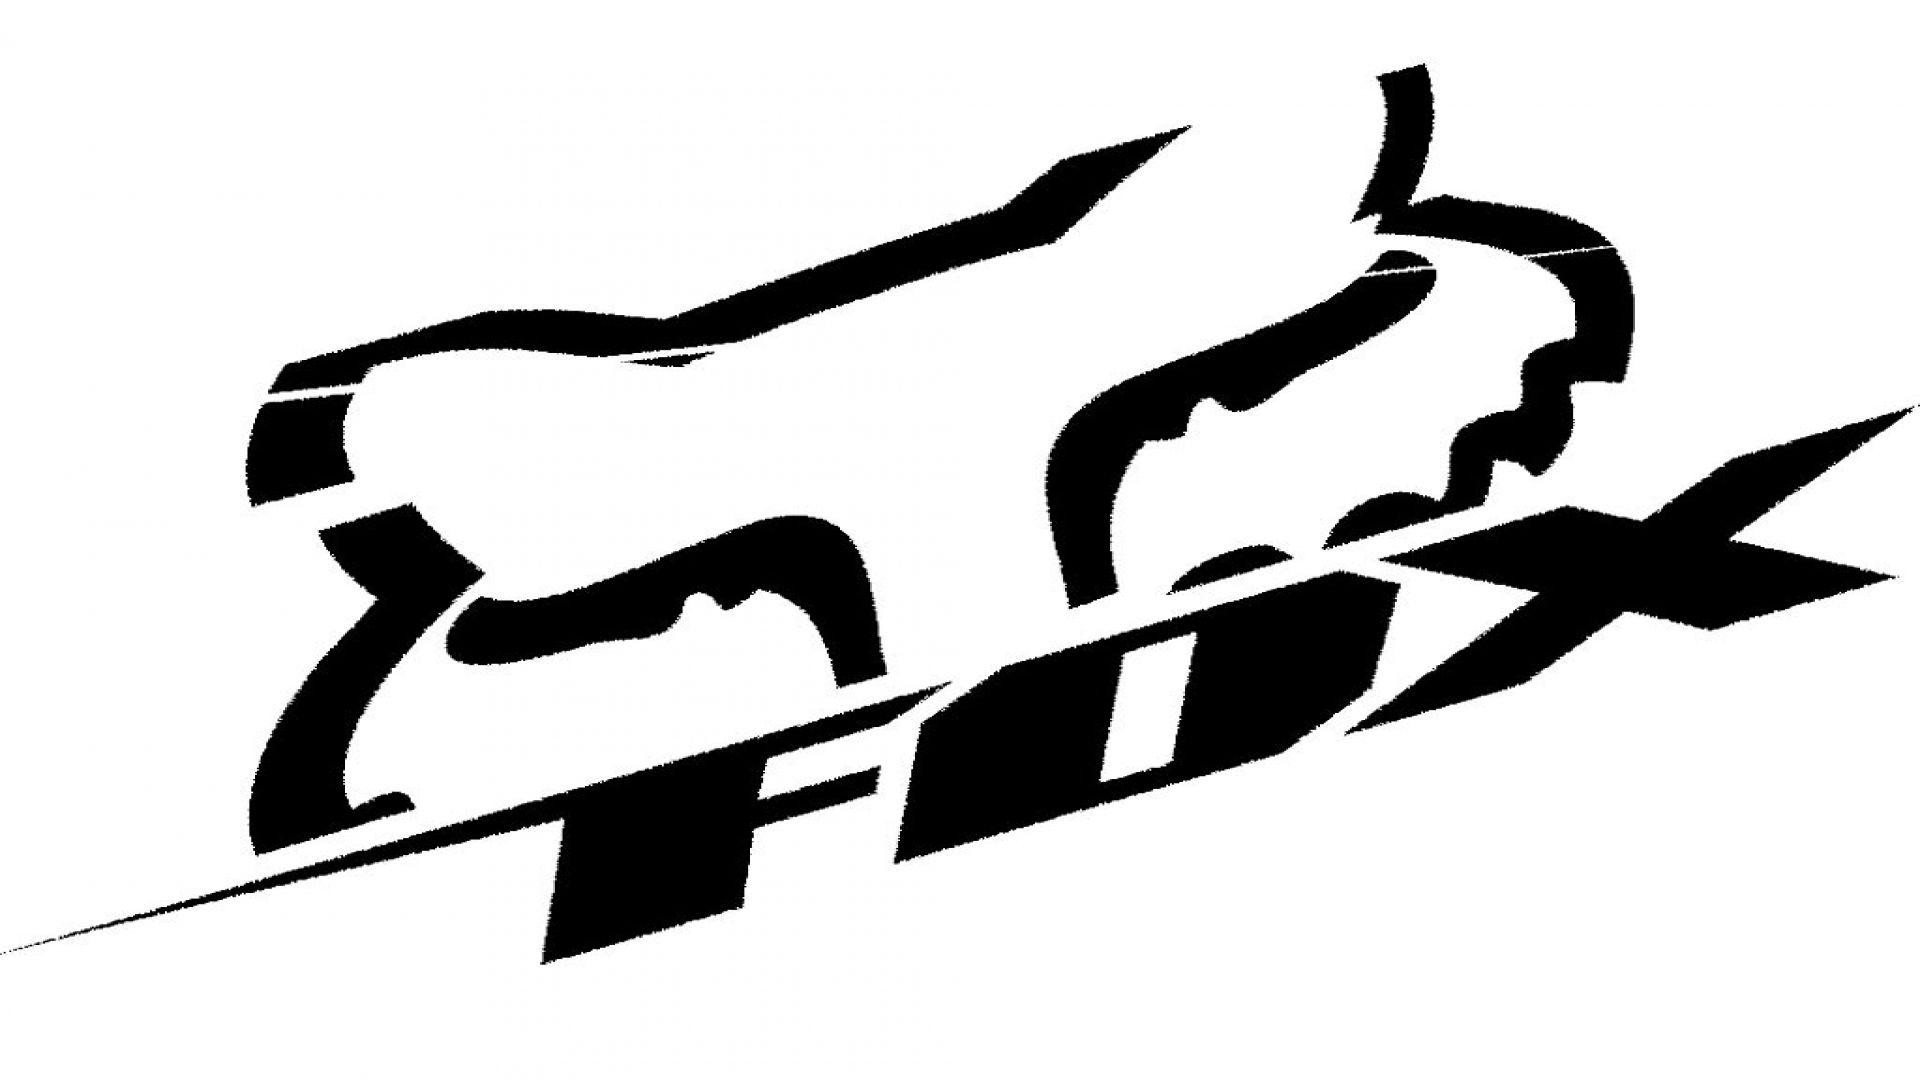 Fox Racing Logo Wallpapers Wallpaper 1920x1080